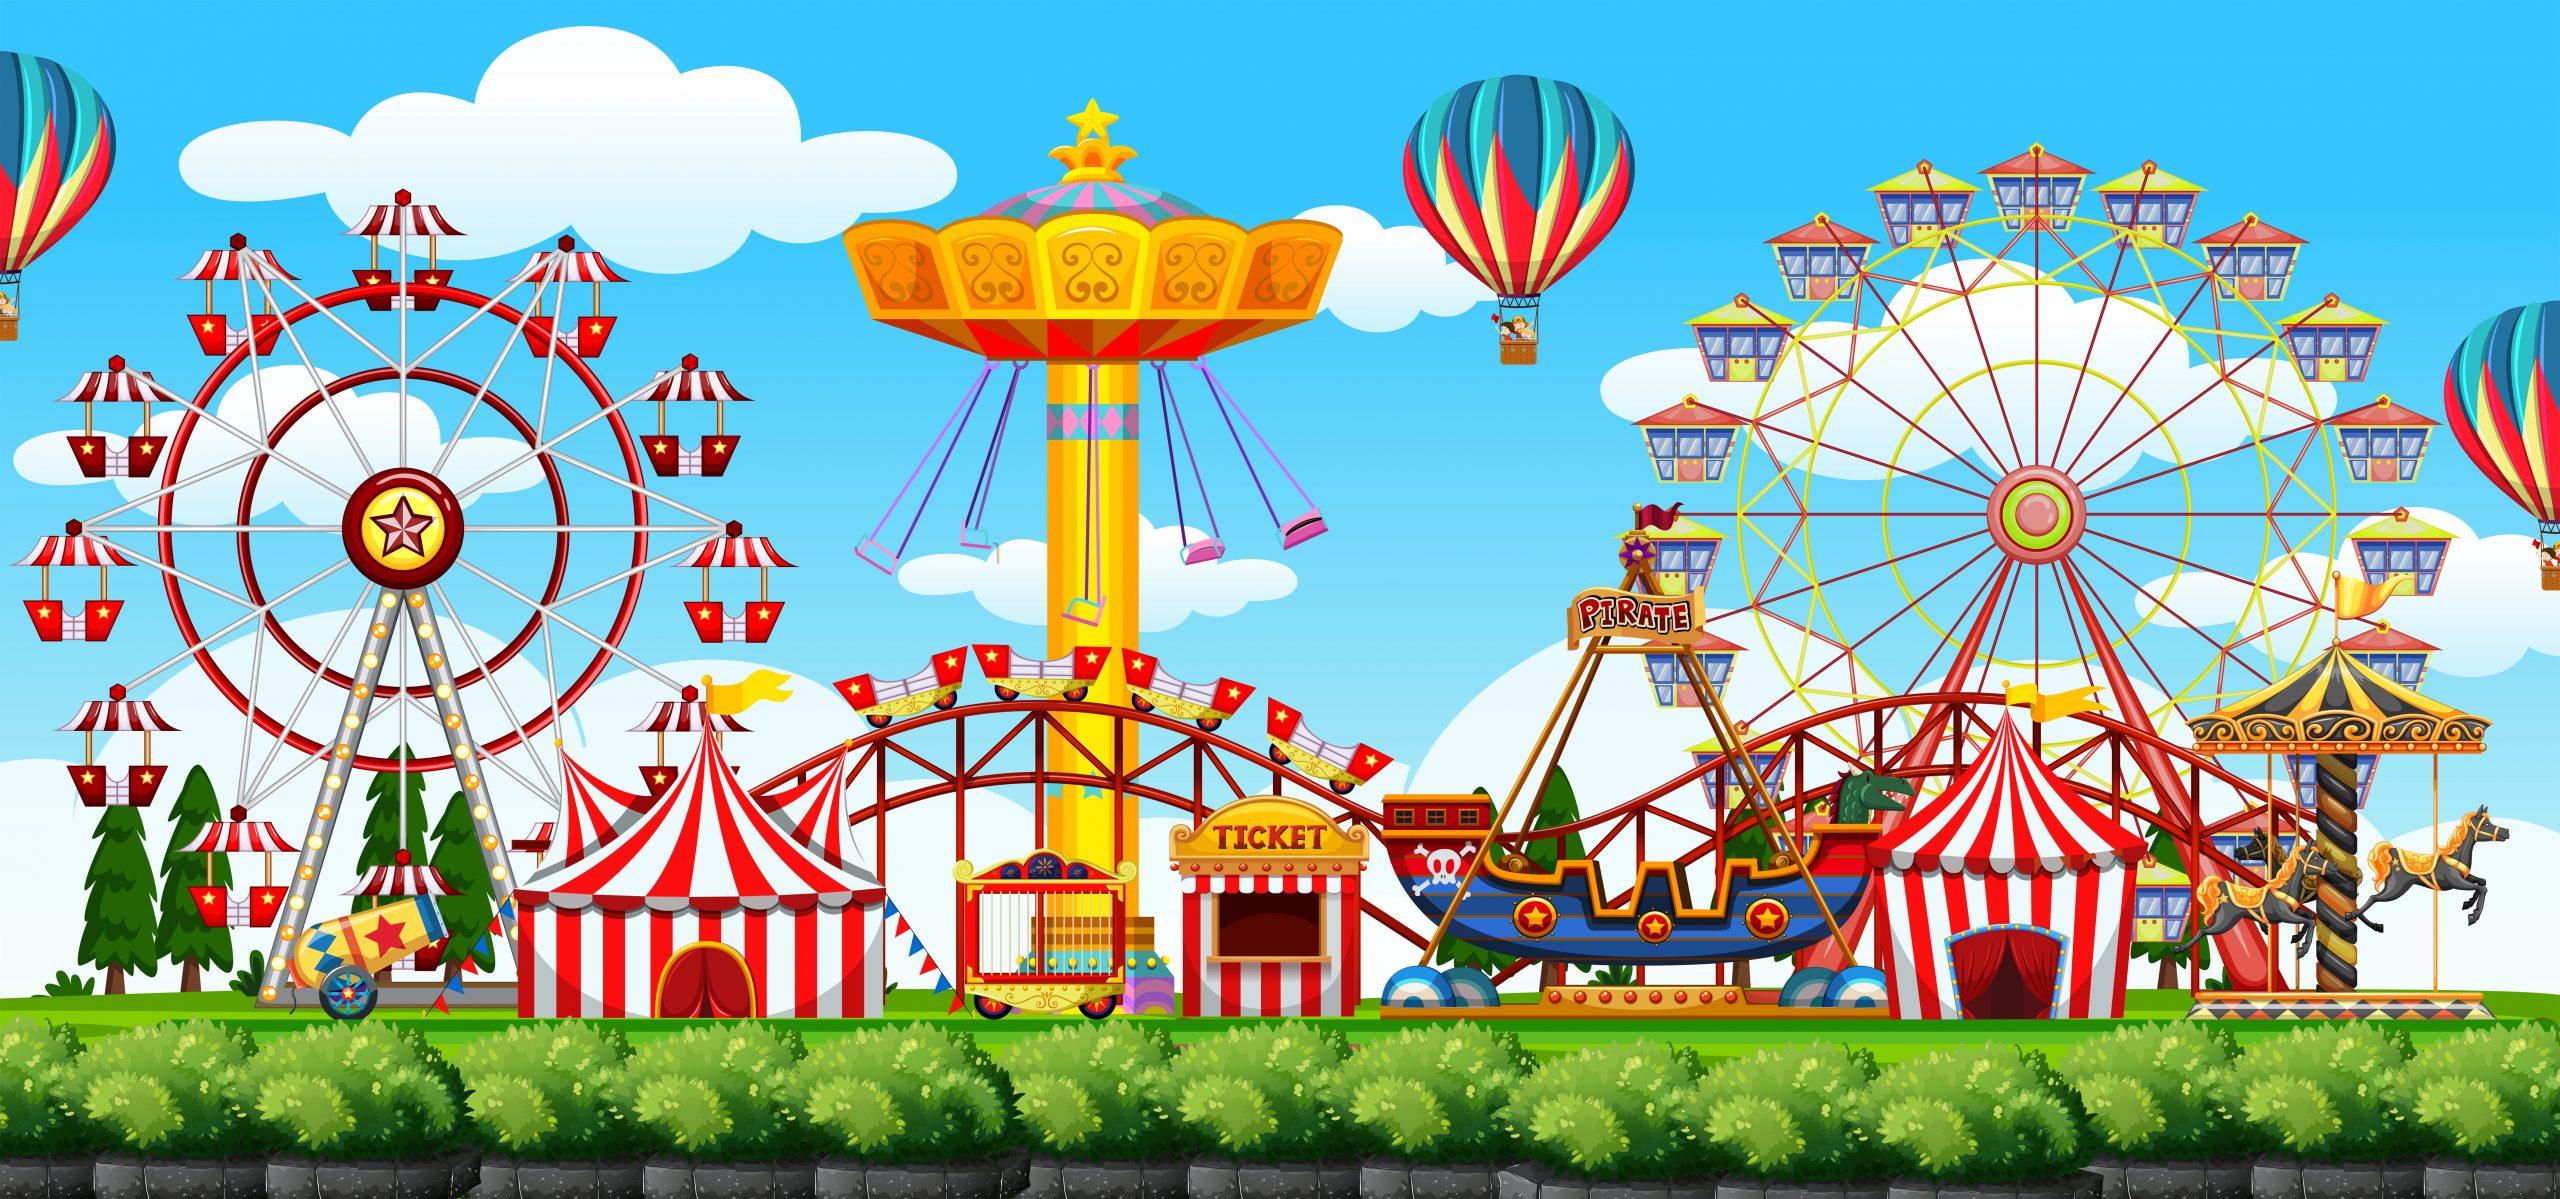 A theme park scene illustration